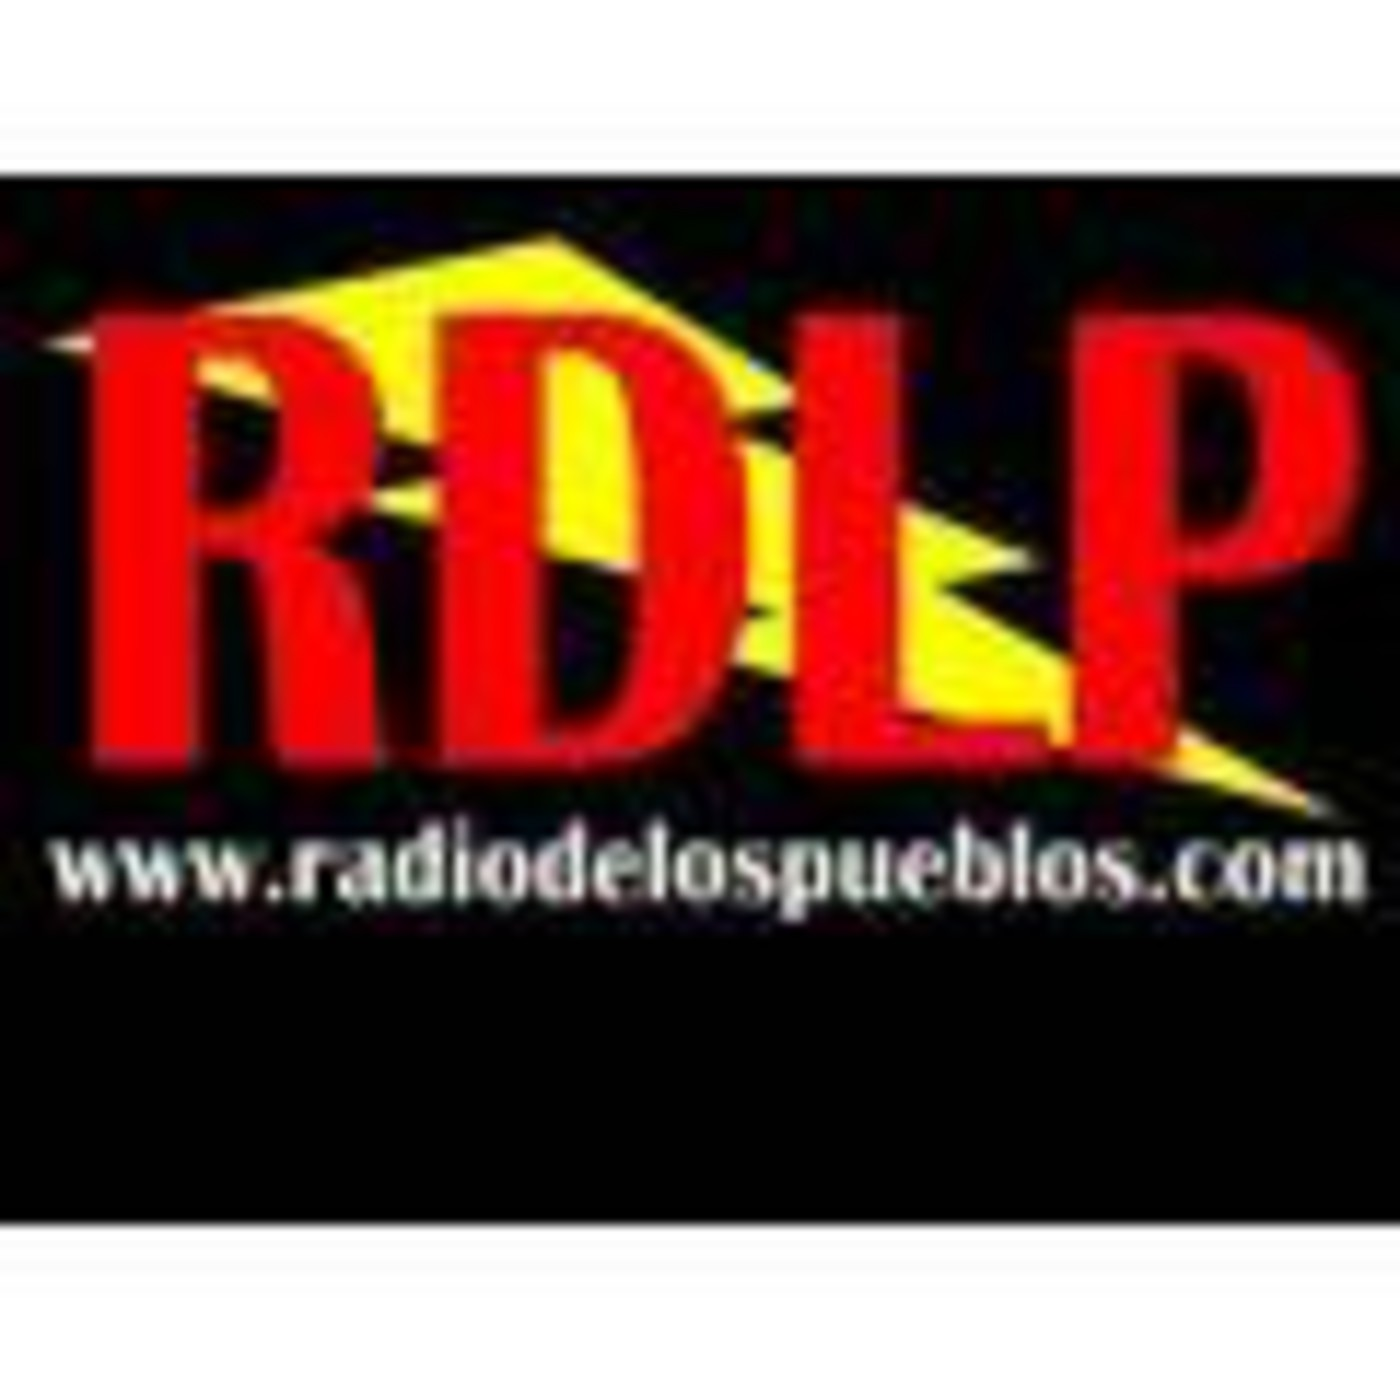 radiodelospueblos